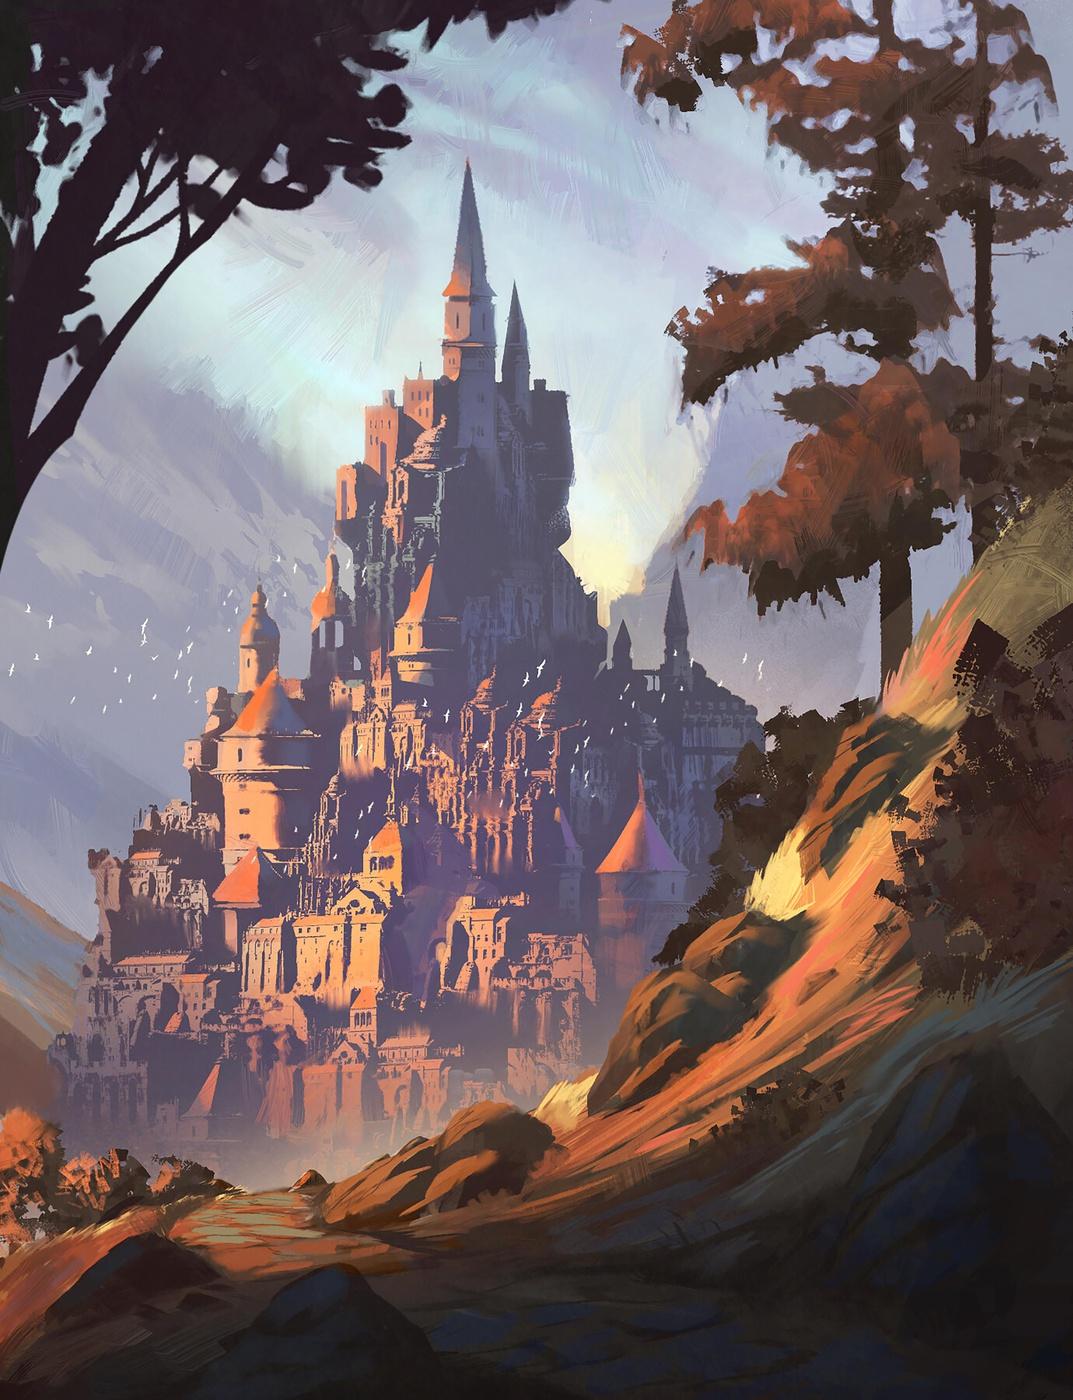 wealthy city castle environment sketch draw